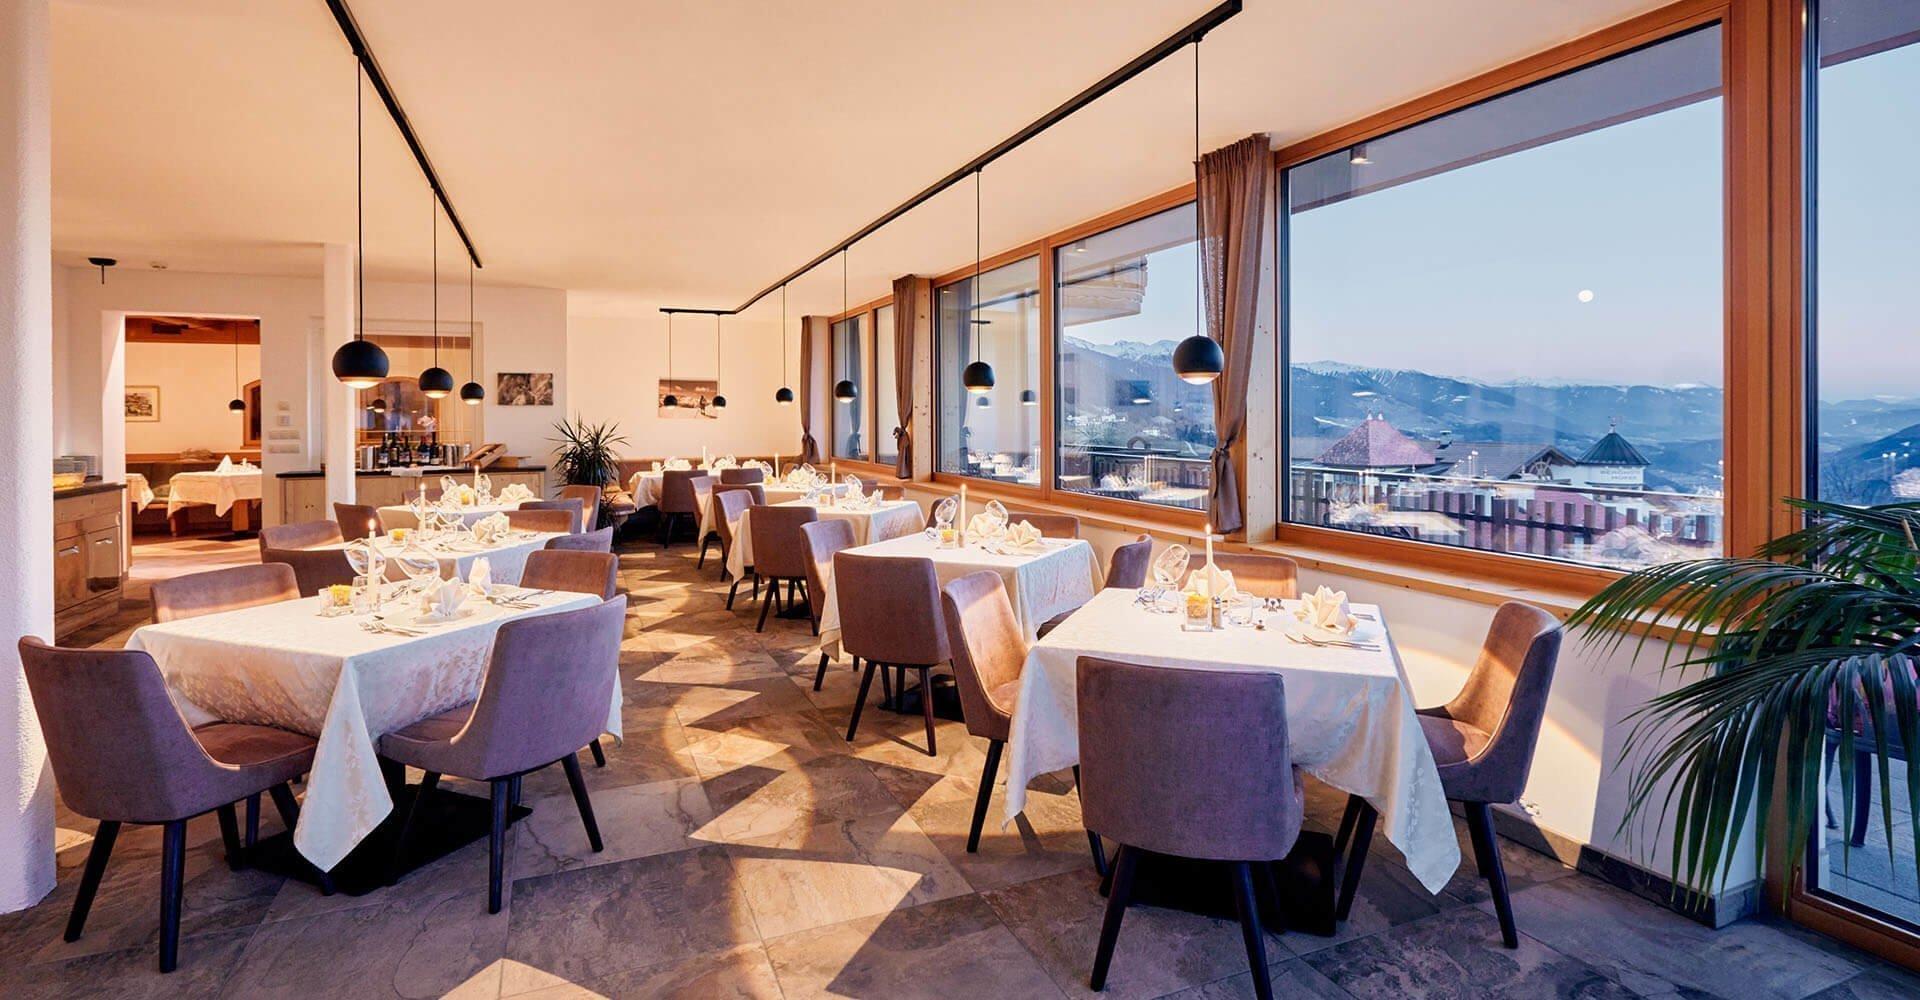 Hotel Kristall - Unser Wanderhotel am Gitschberg/Jochtal | Ihr Ski- & Wanderhotel in Südtirol